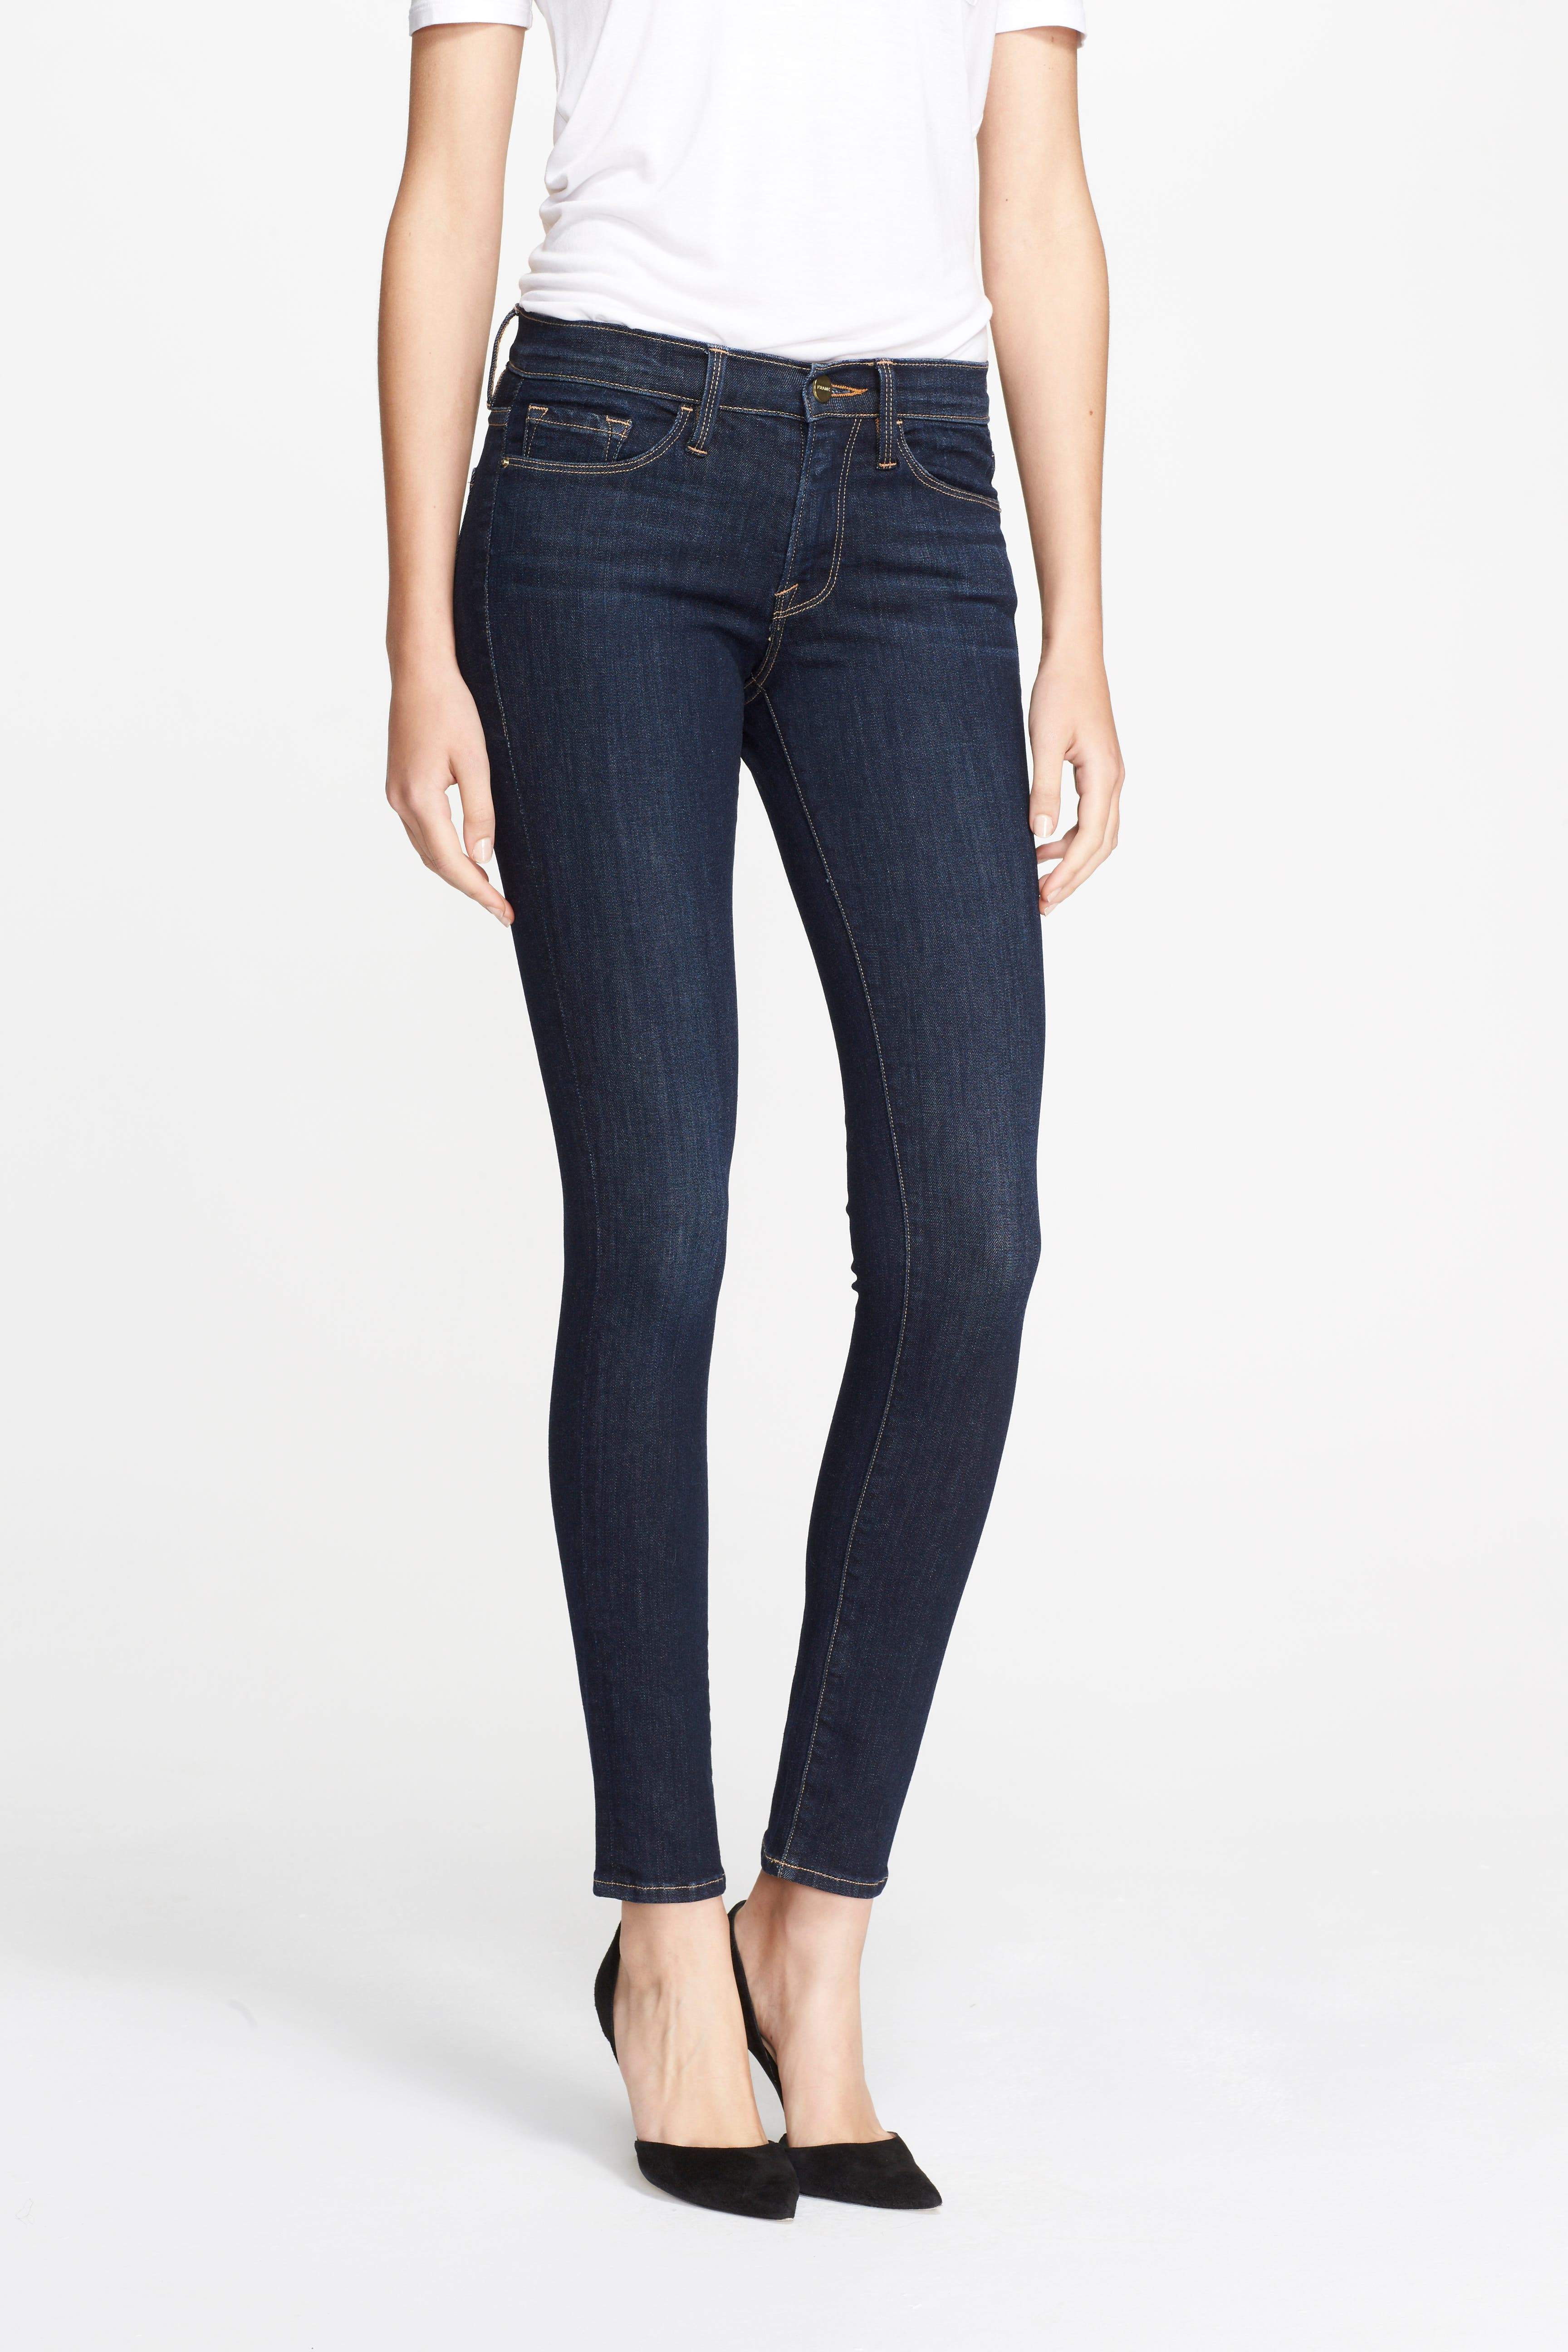 Alternate Image 1 Selected - FRAME 'Le Skinny de Jeanne' Jeans (Queensway)